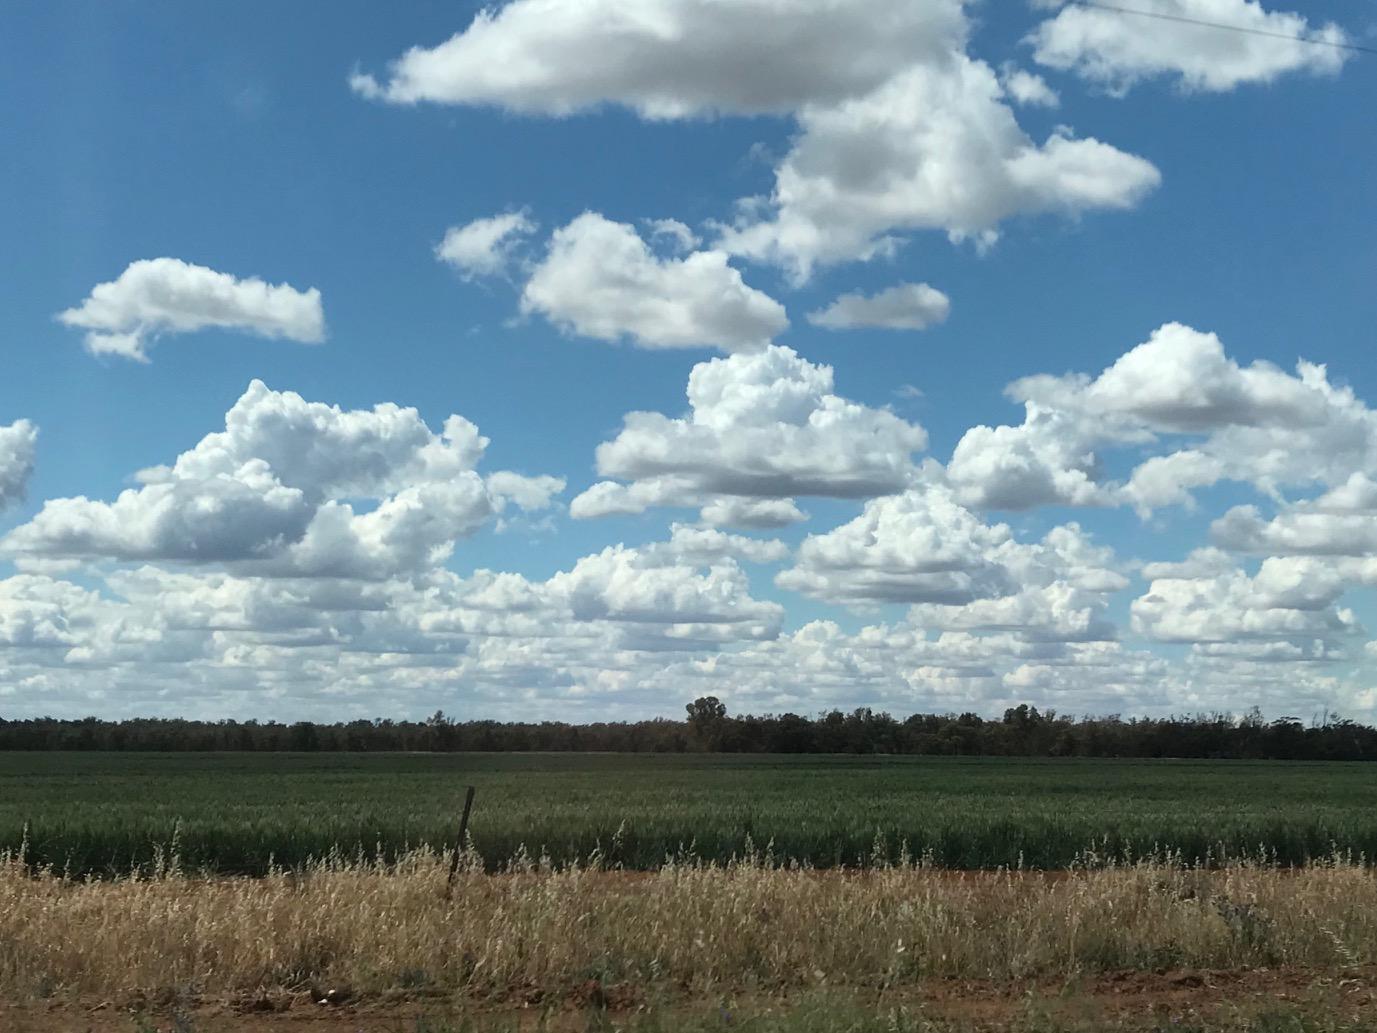 Crop_clouds